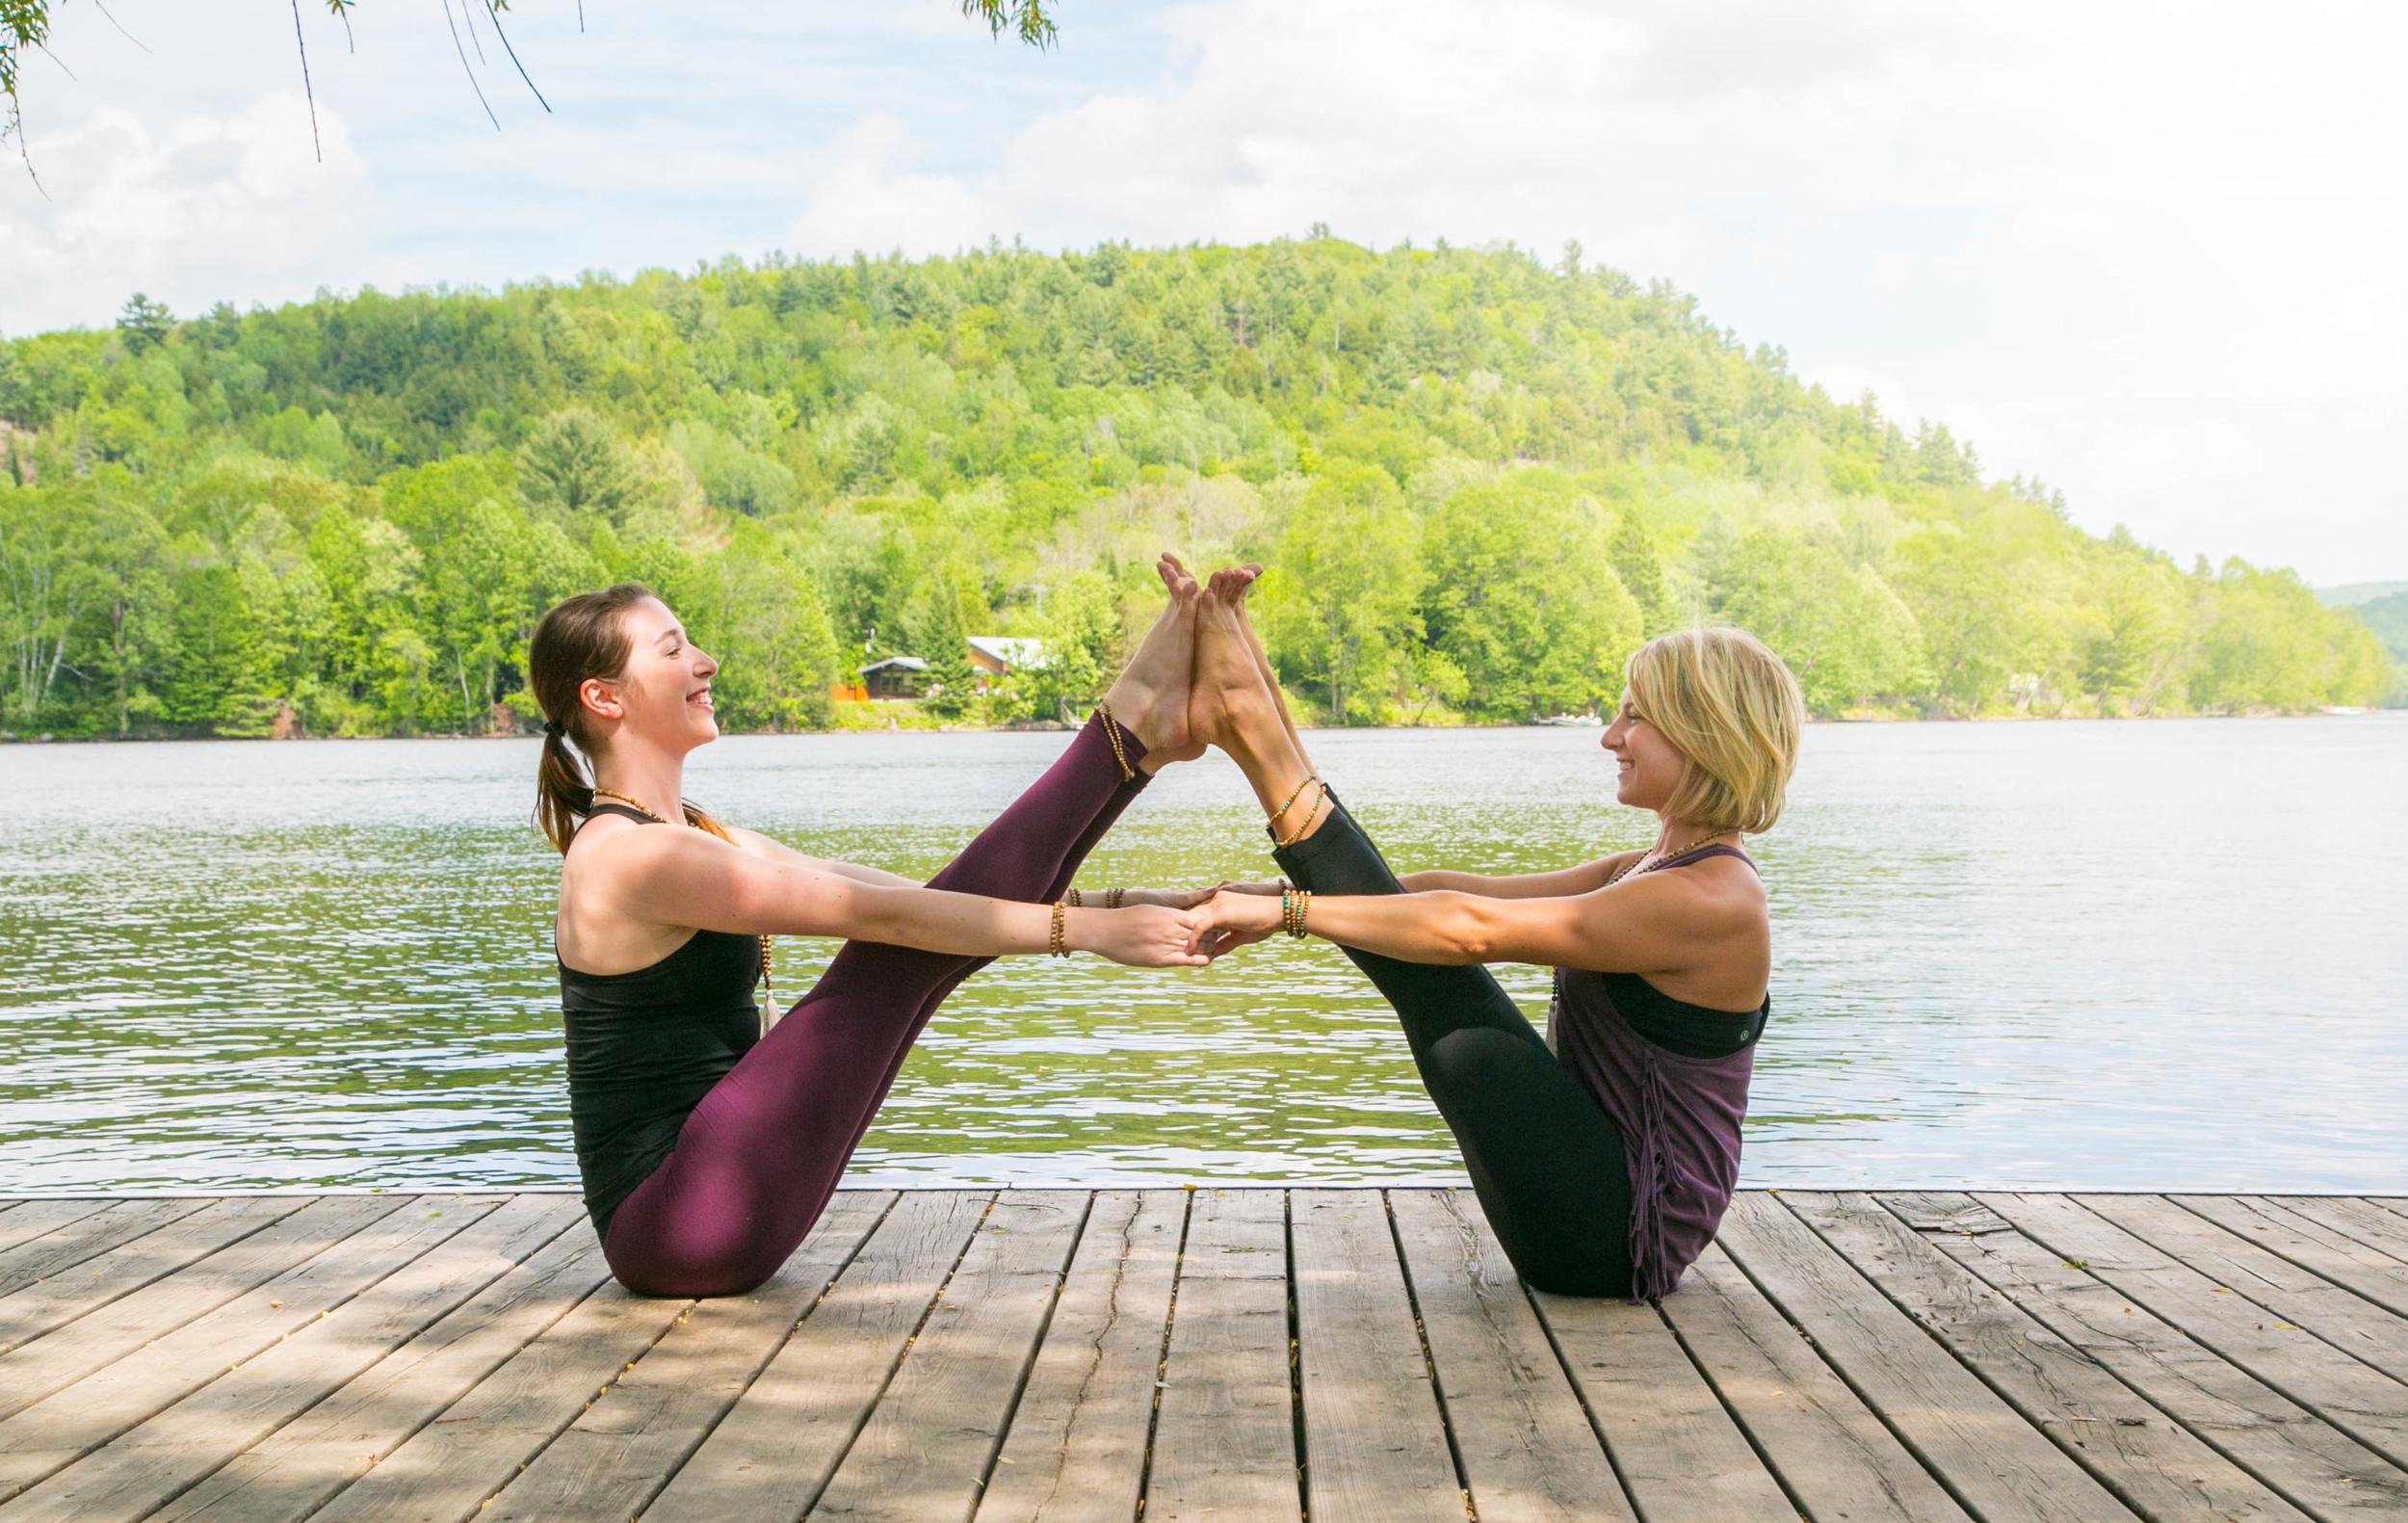 Partner Yoga with @yogawithkassandra wearing @MalaRae designs captured by Aida Robbins.